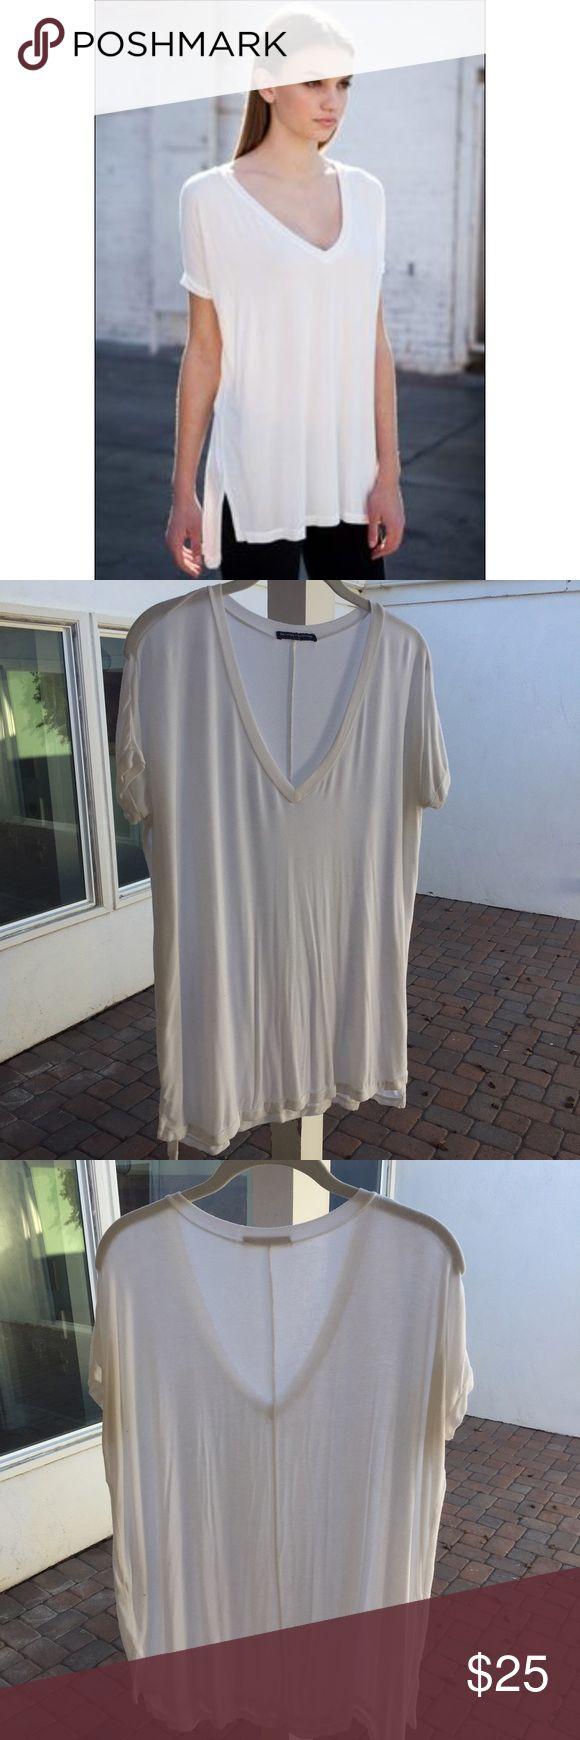 Brandy Melville Milan Top Silky soft white v neck tee Brandy Melville Tops Tees - Short Sleeve